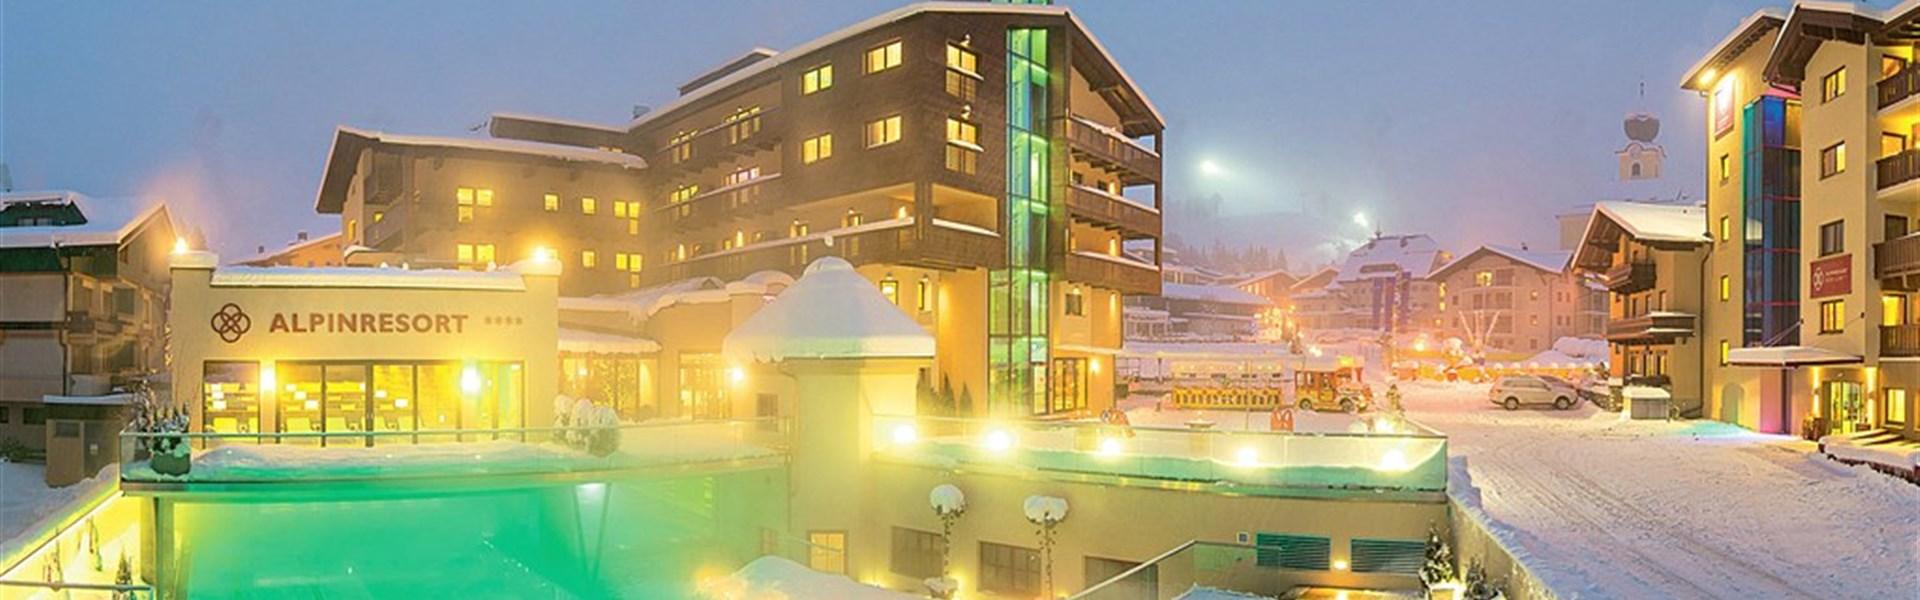 Marco Polo - Alpinresort Sport & Spa -